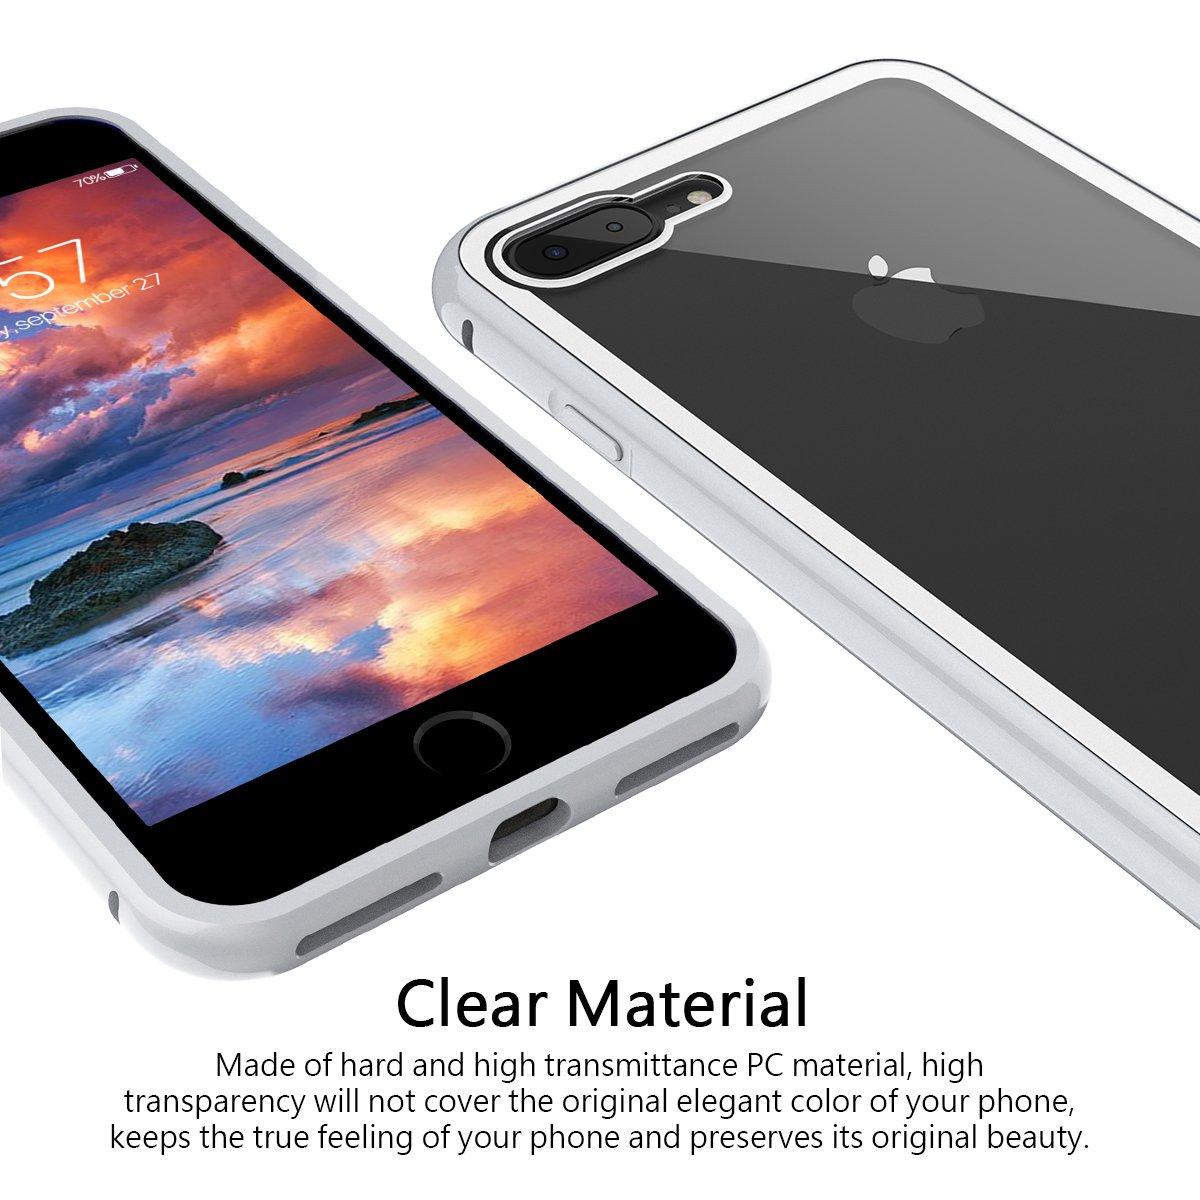 1ac8cad0bcf CE-Link Funda iPhone 7 Plus Funda iPhone 8 Plus Carcasa Fundas Magné tica  Cubierta de Trasera de Vidrio Templado Transparente ...